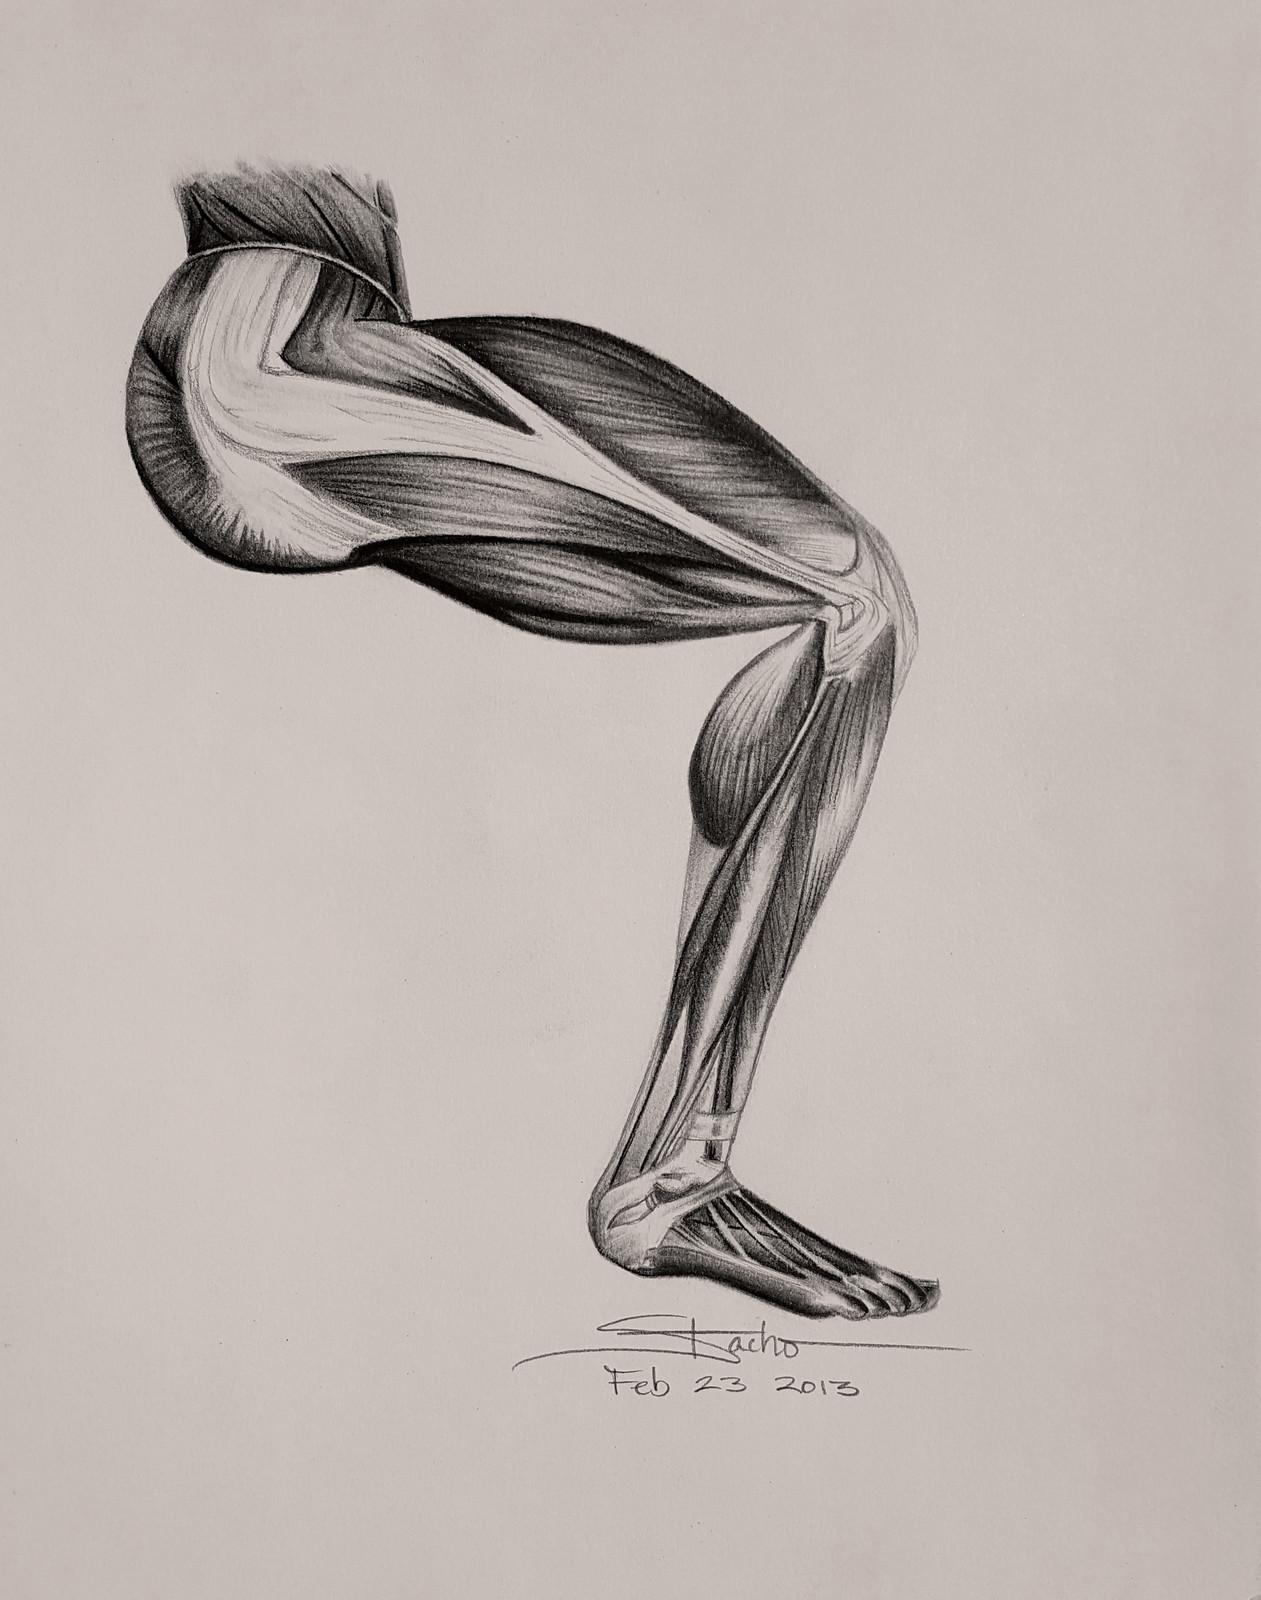 Anatomy of the Right Leg